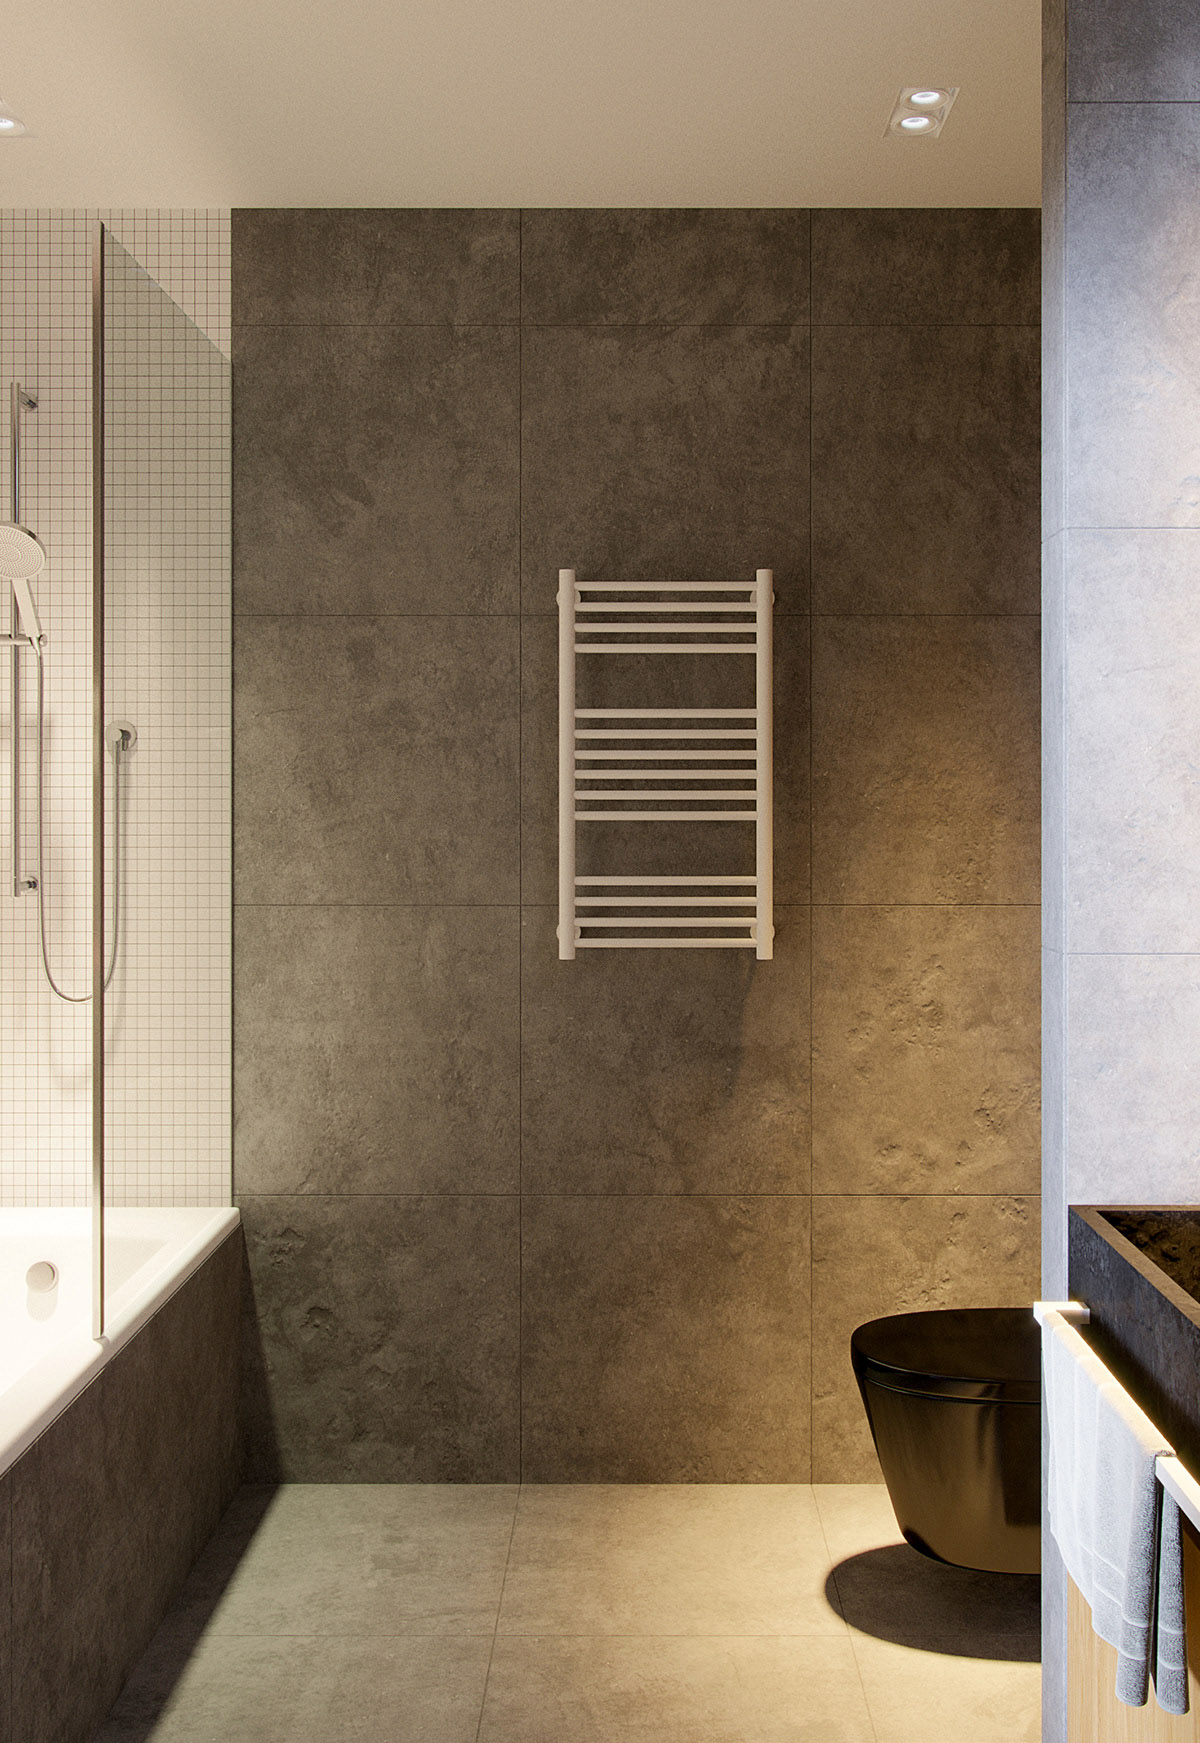 cream-towel-heater-600x872.jpg